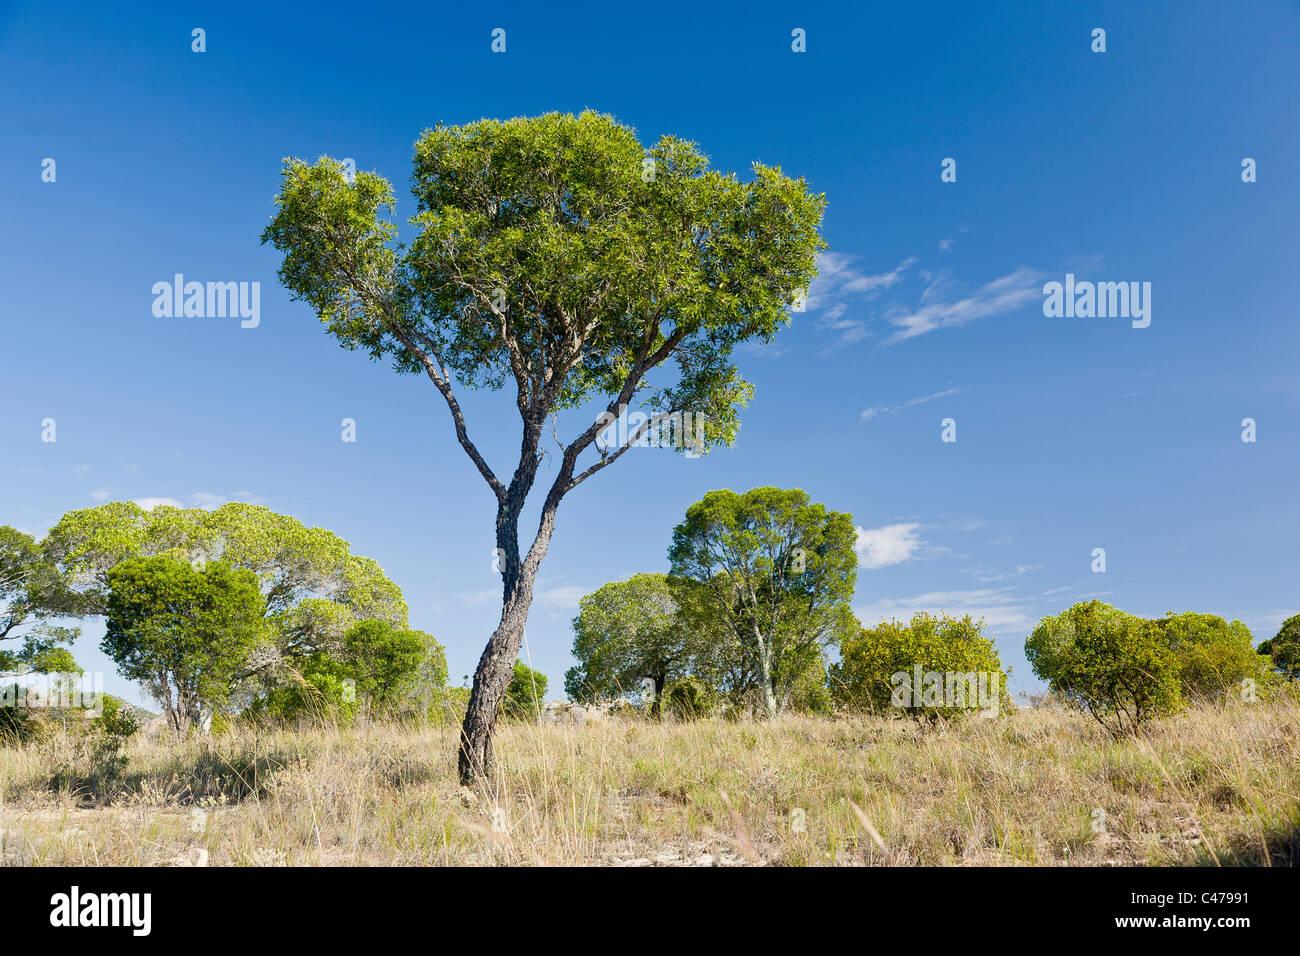 Tapia tree, Uapaca bojeri, Isalo, Madagascar - Stock Image